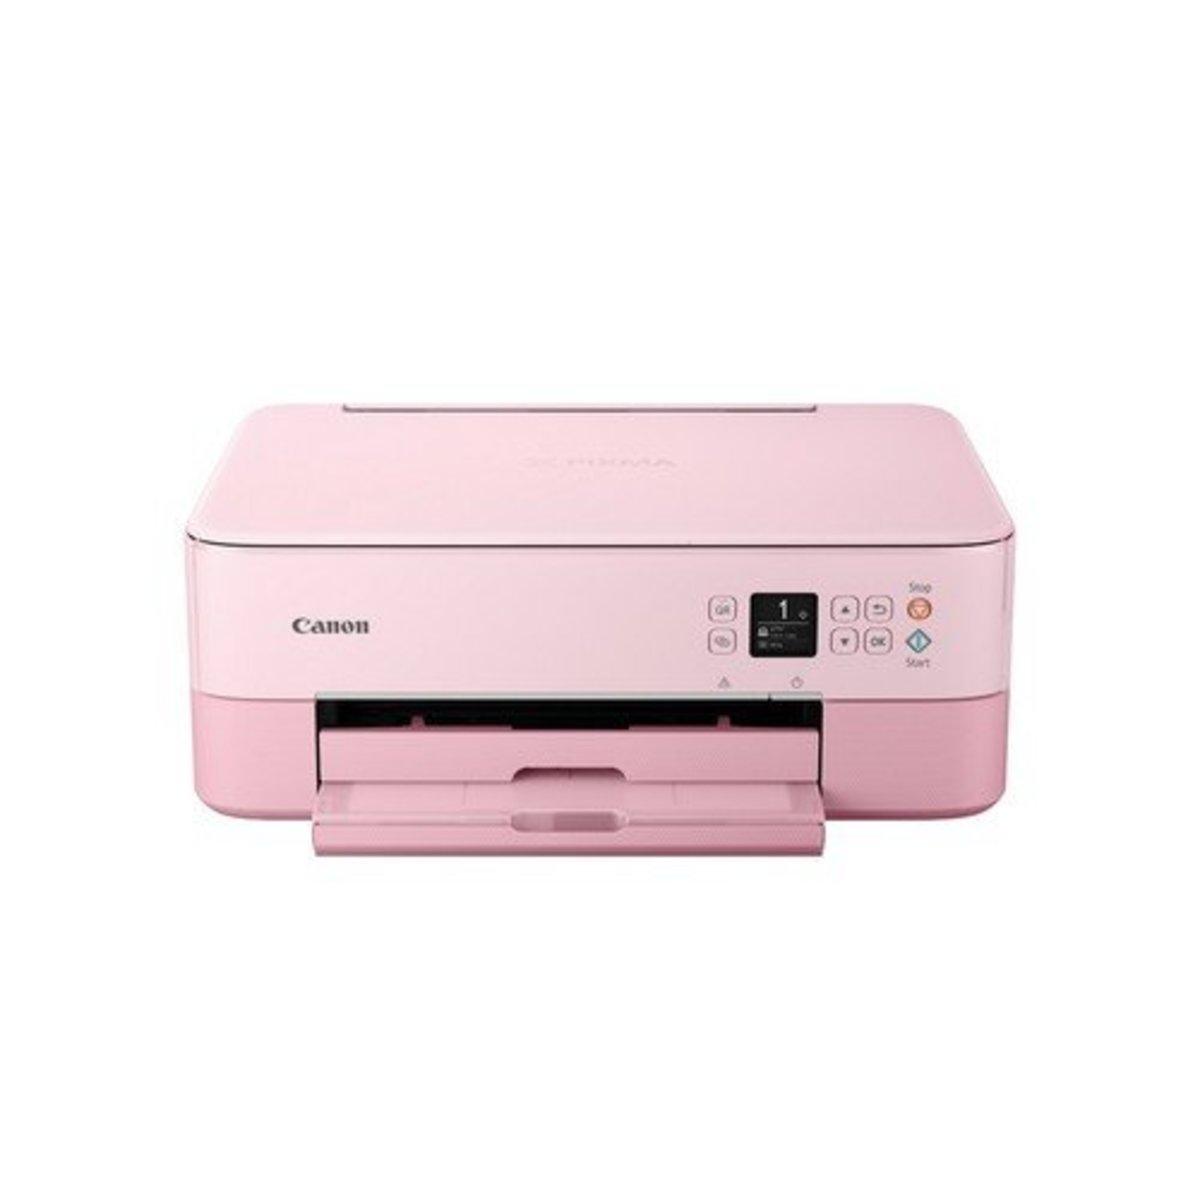 PIXMA TS5370 Pink